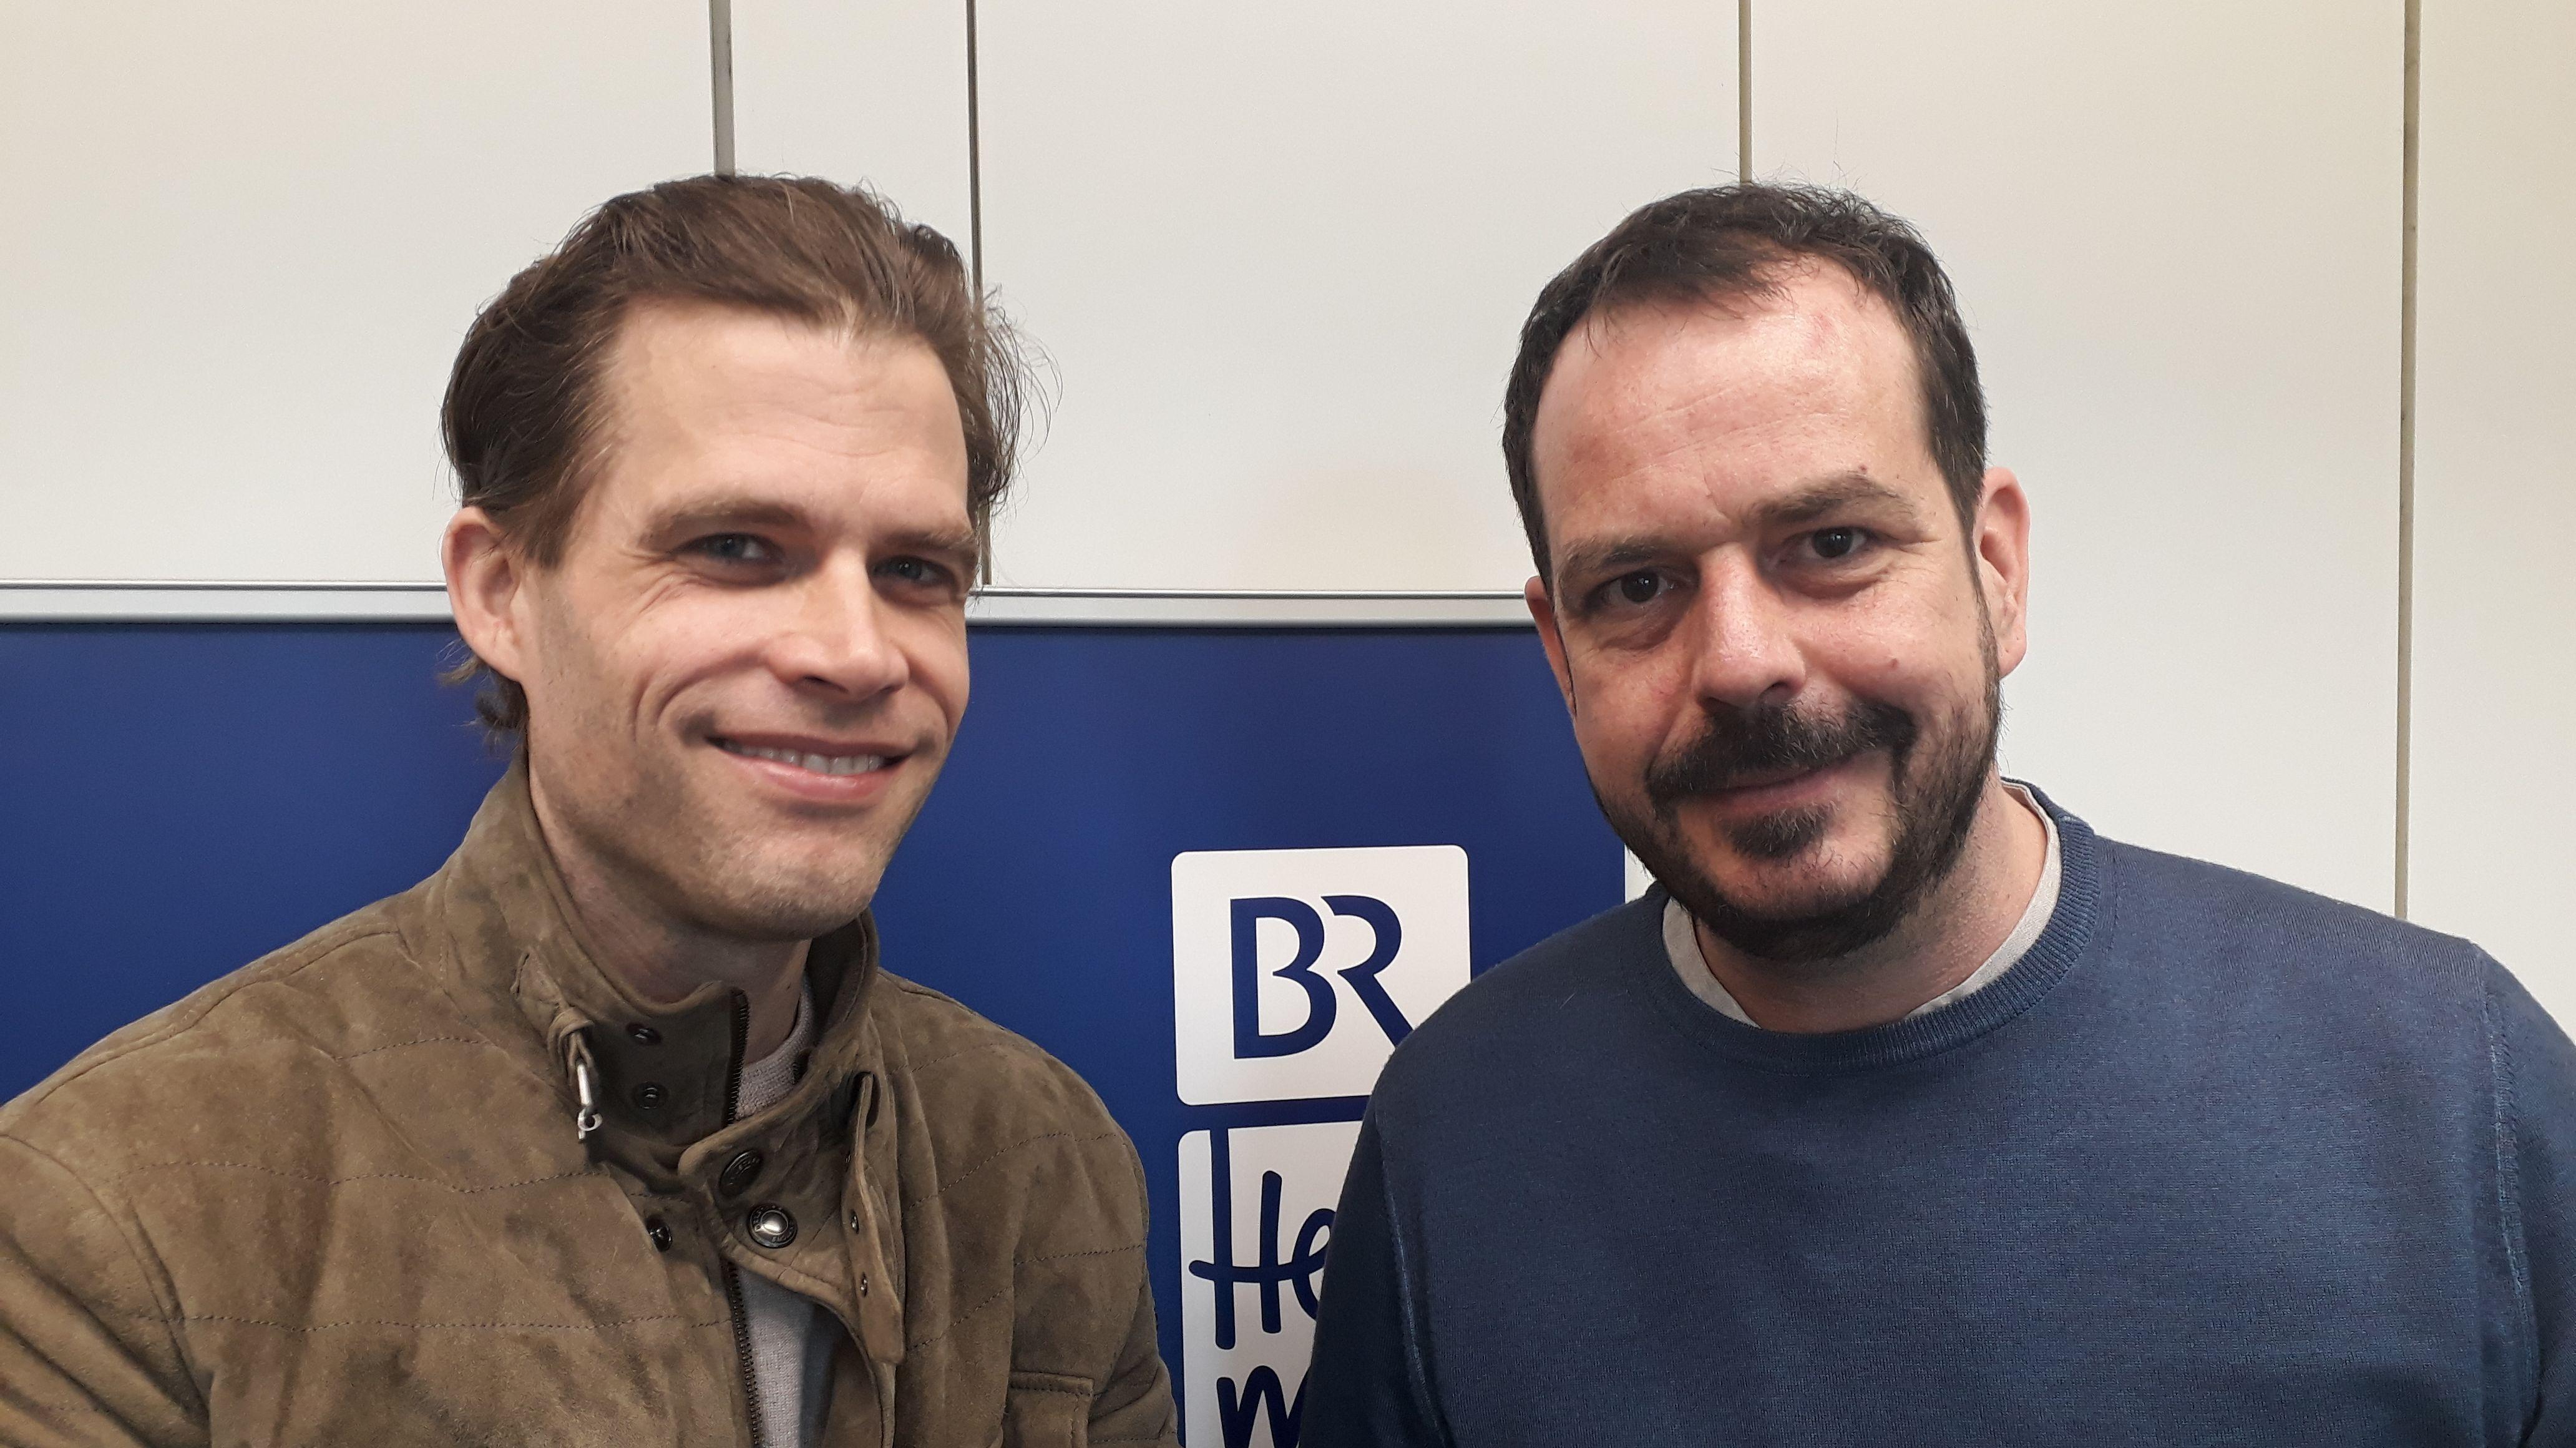 v.l.: Bas Kast, Jochen Wobser